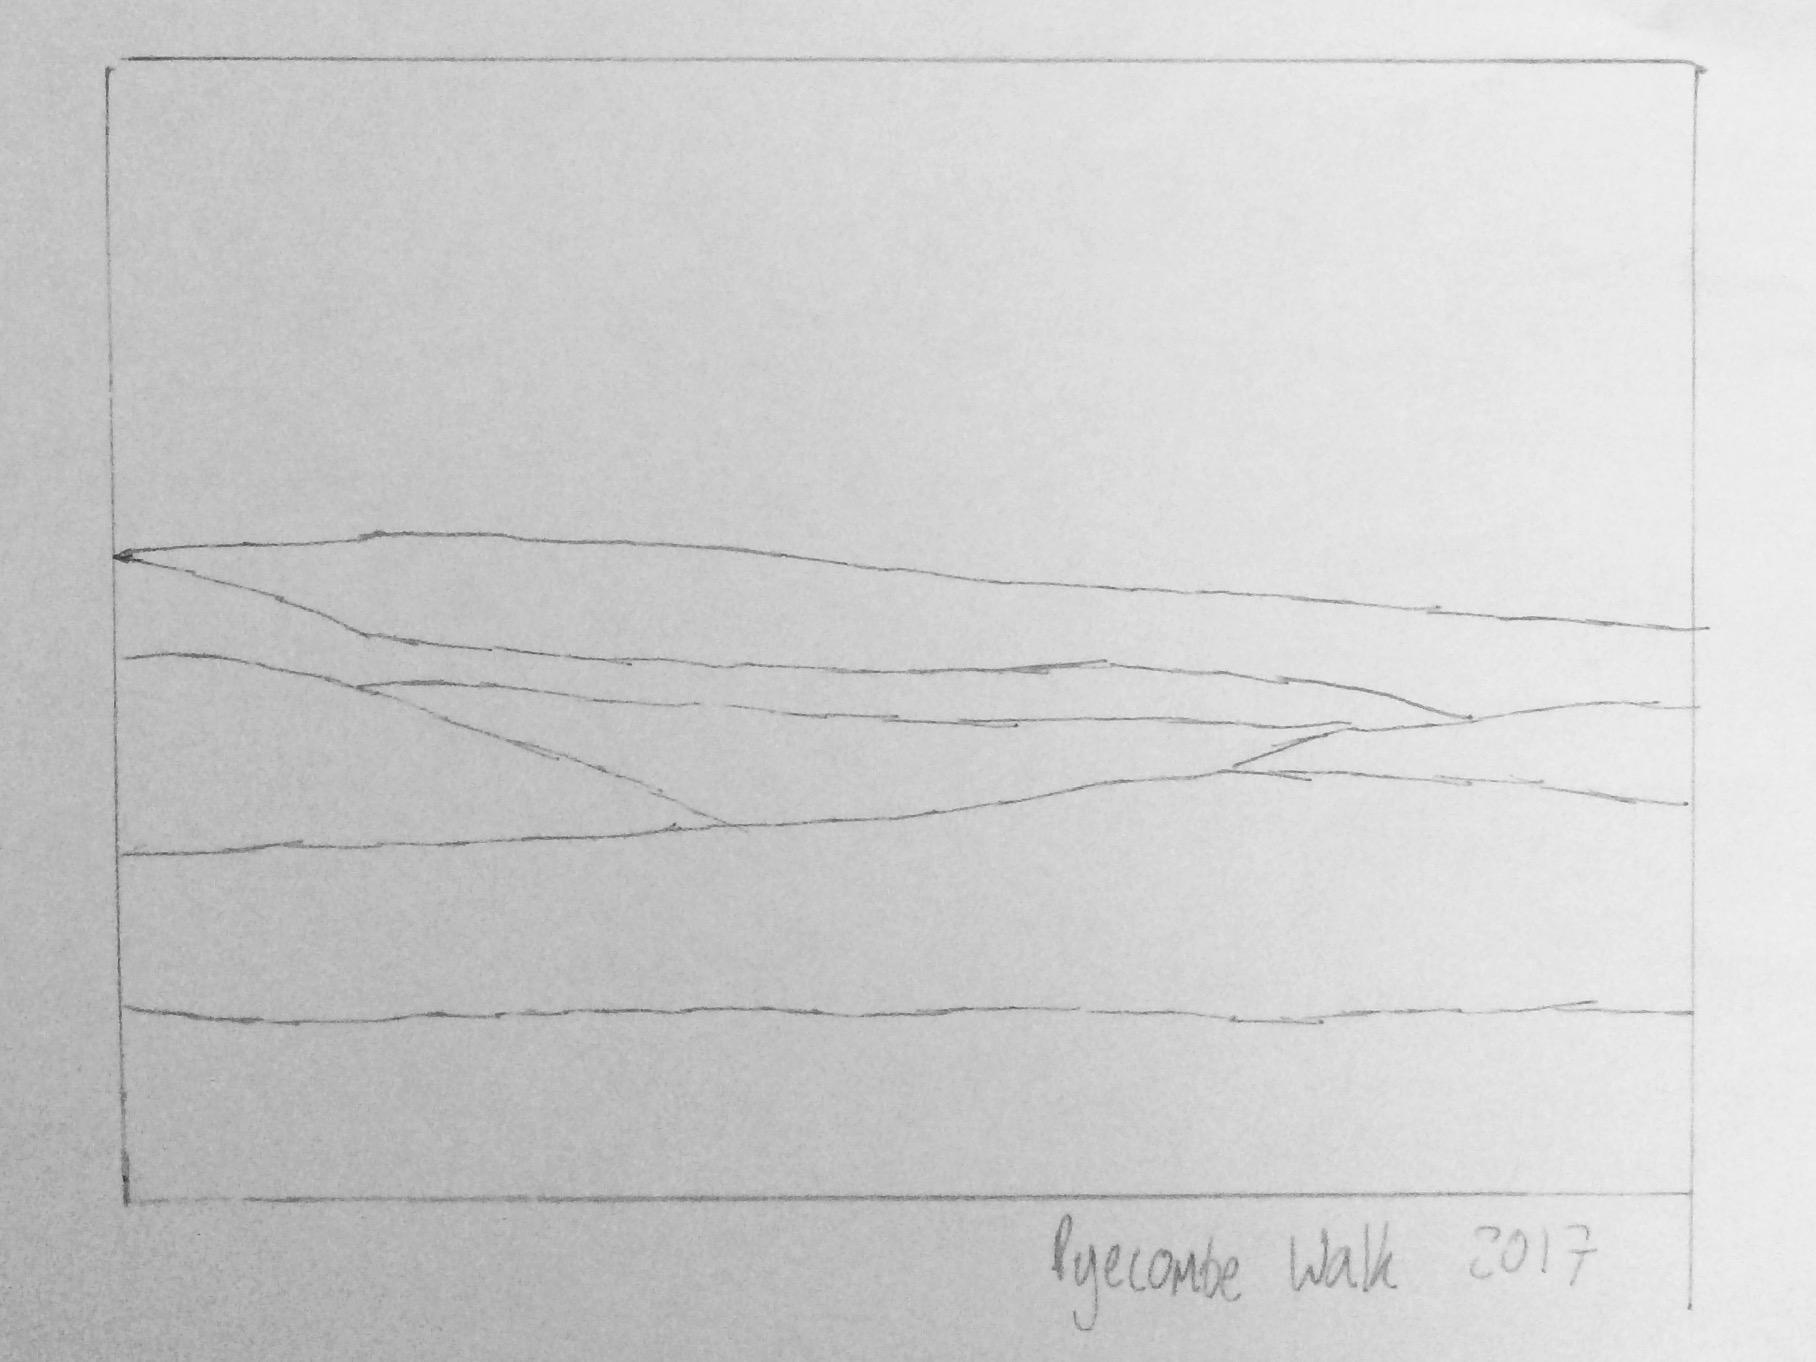 The Biro sketch